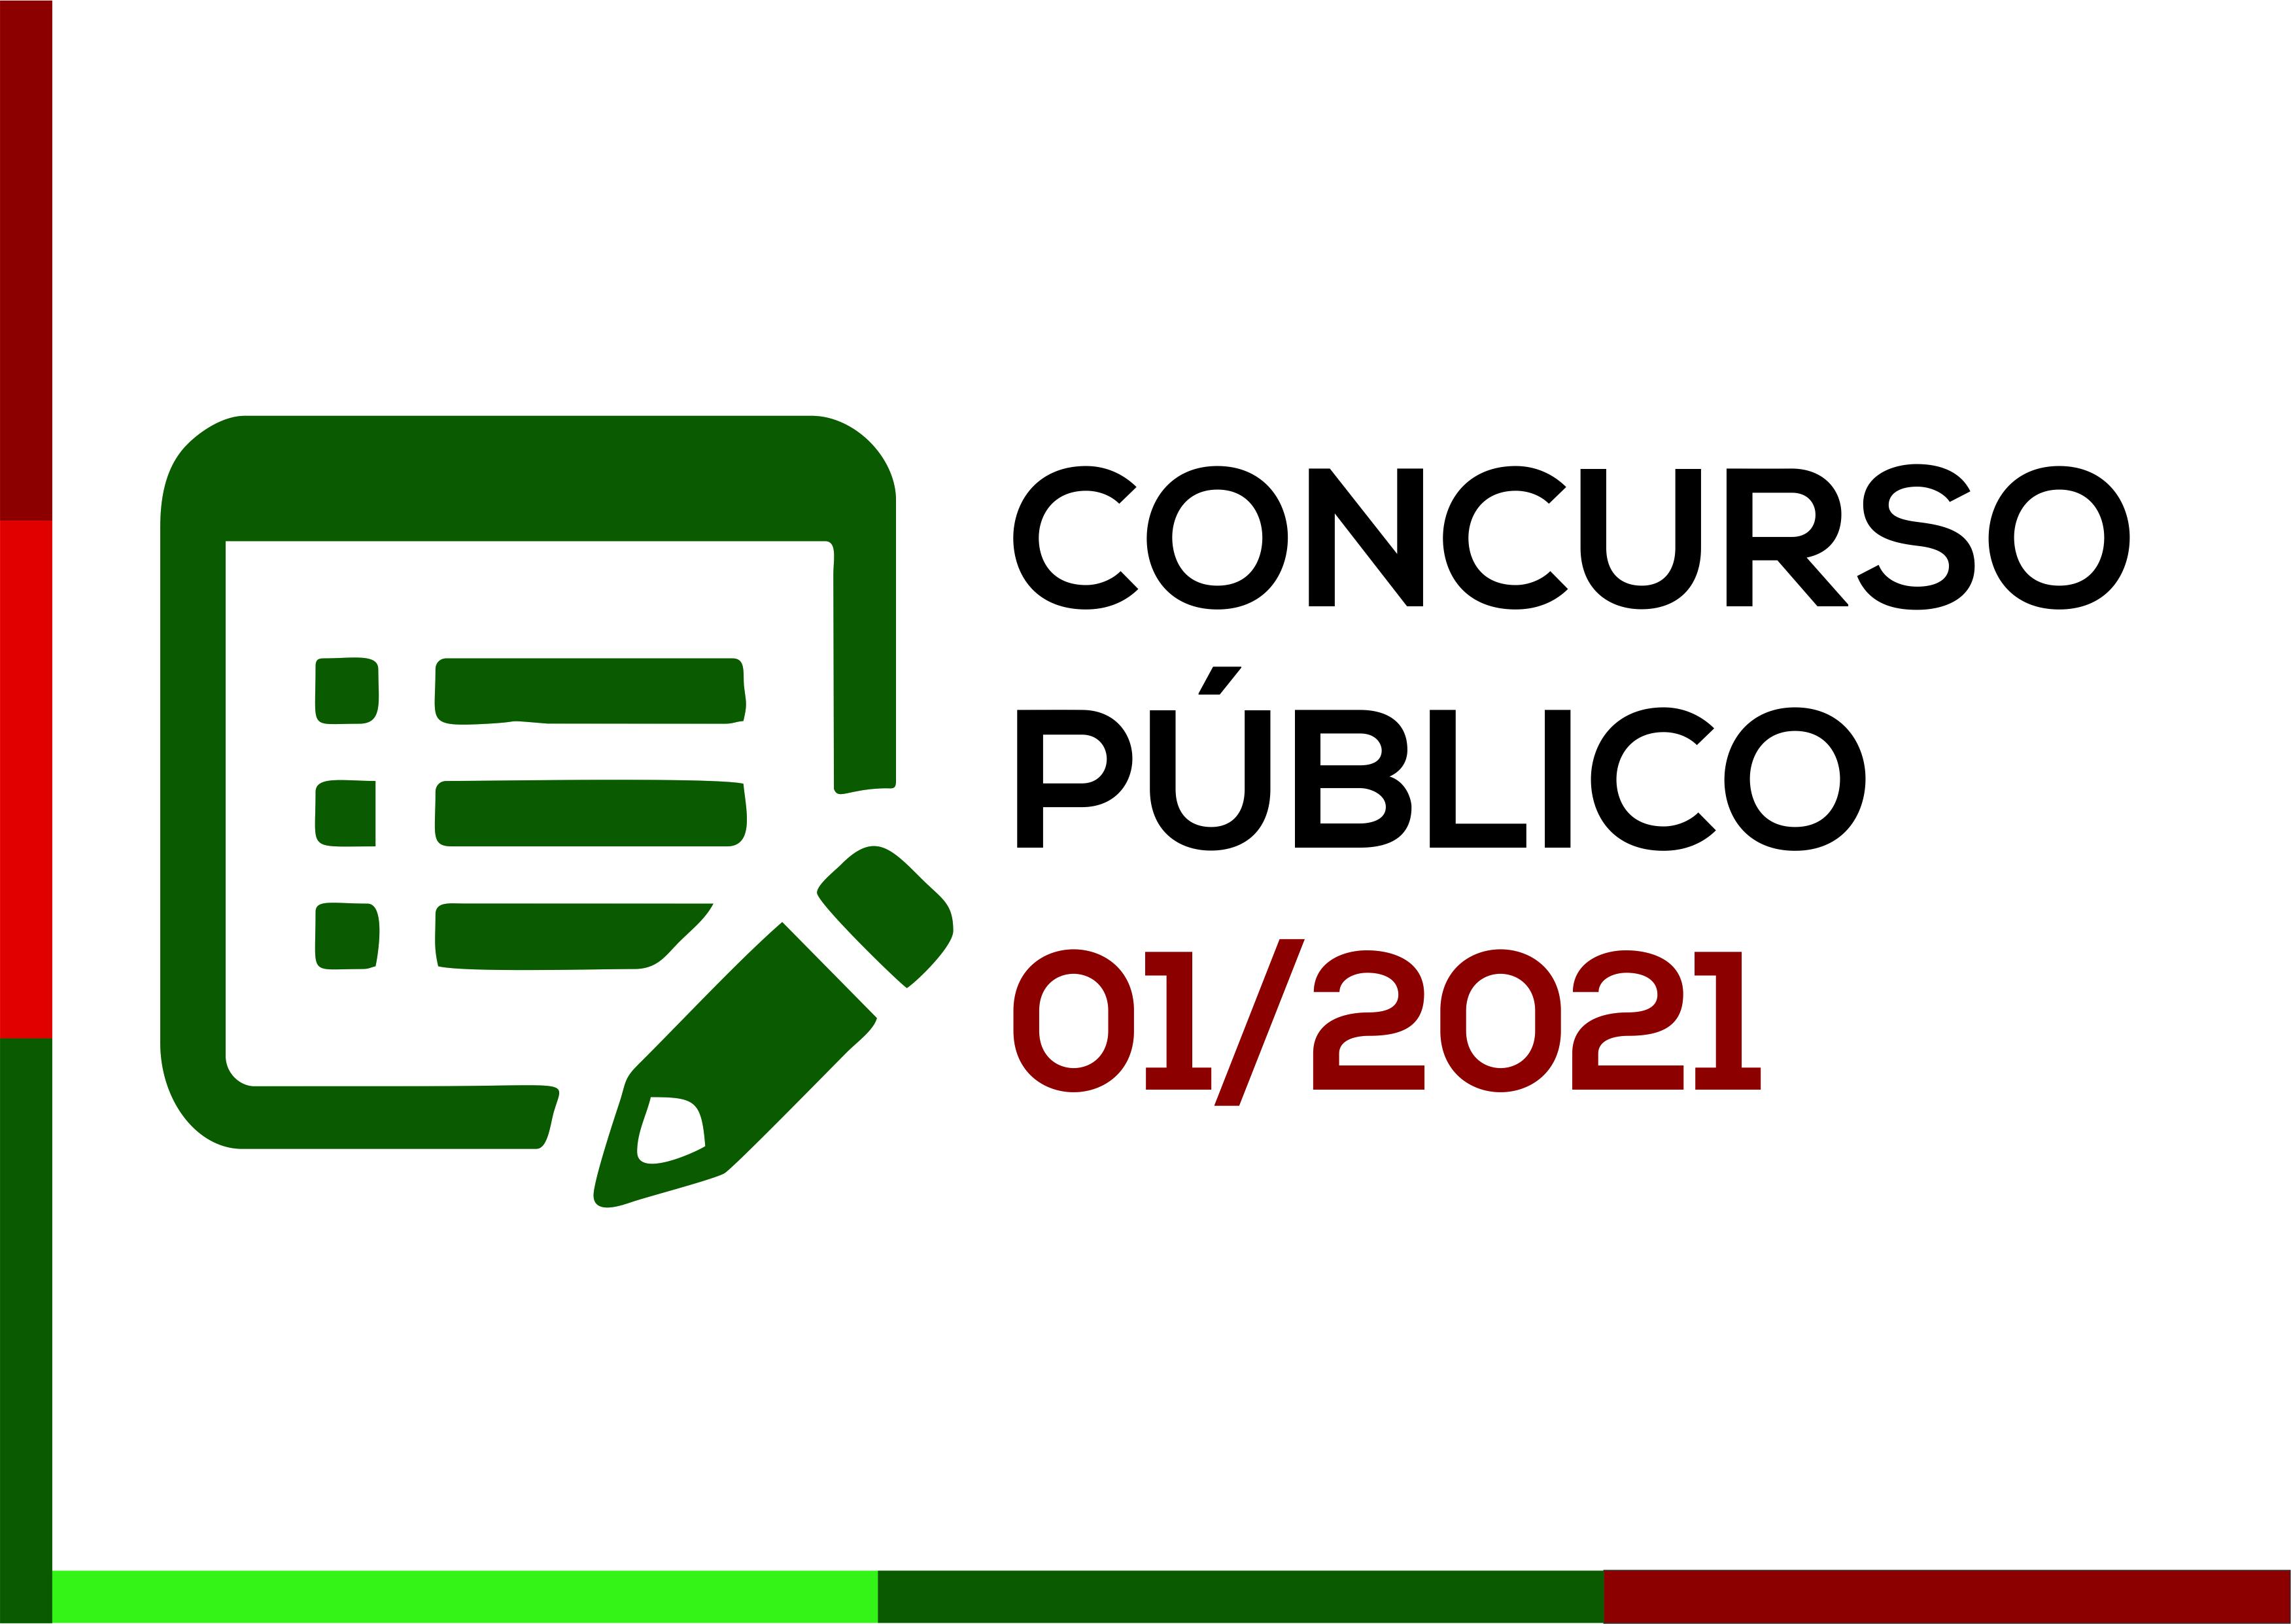 Prefeitura abre o Concurso Público nº 01/2021